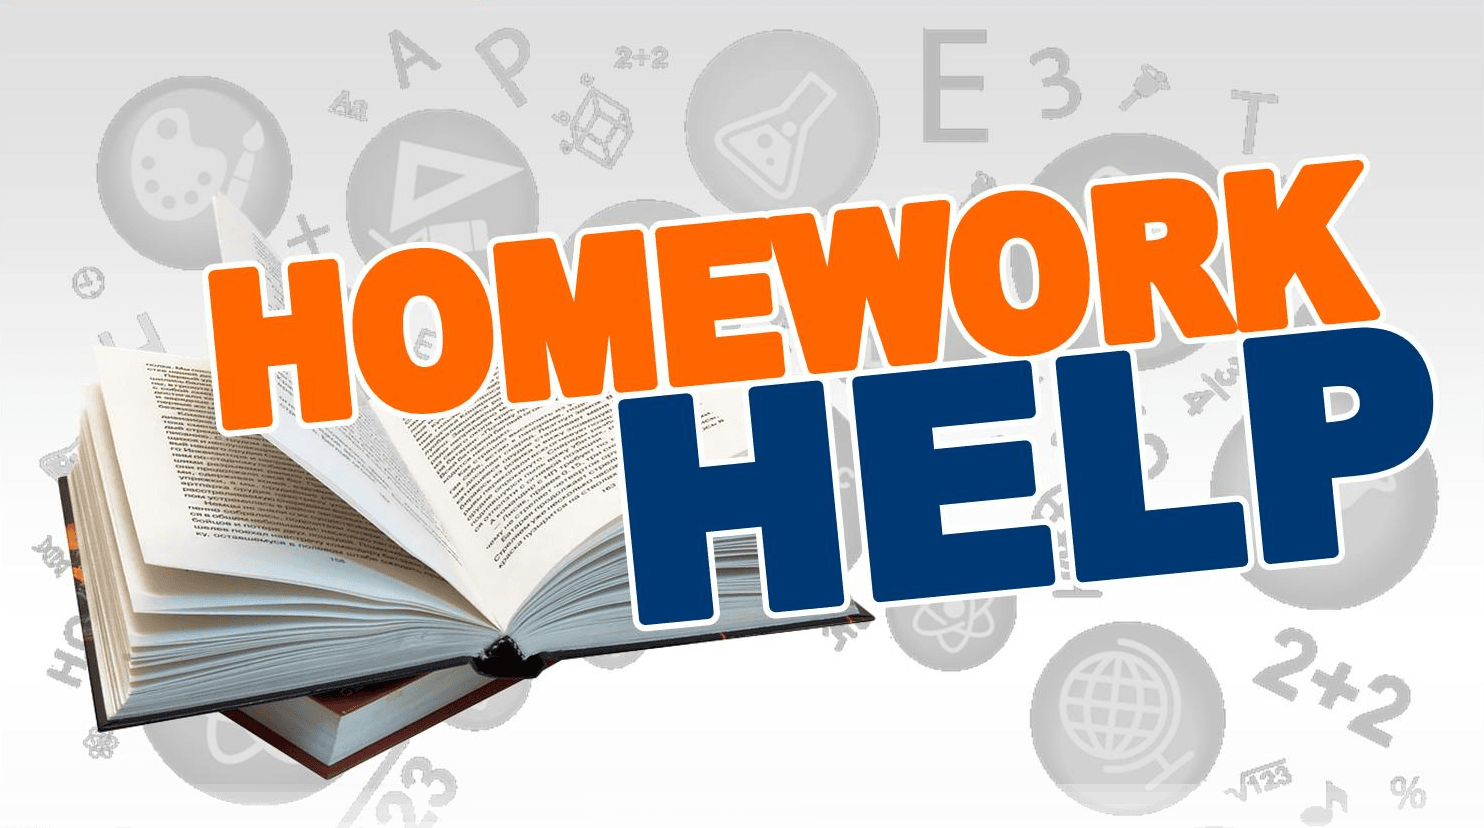 Homework help guelph public library